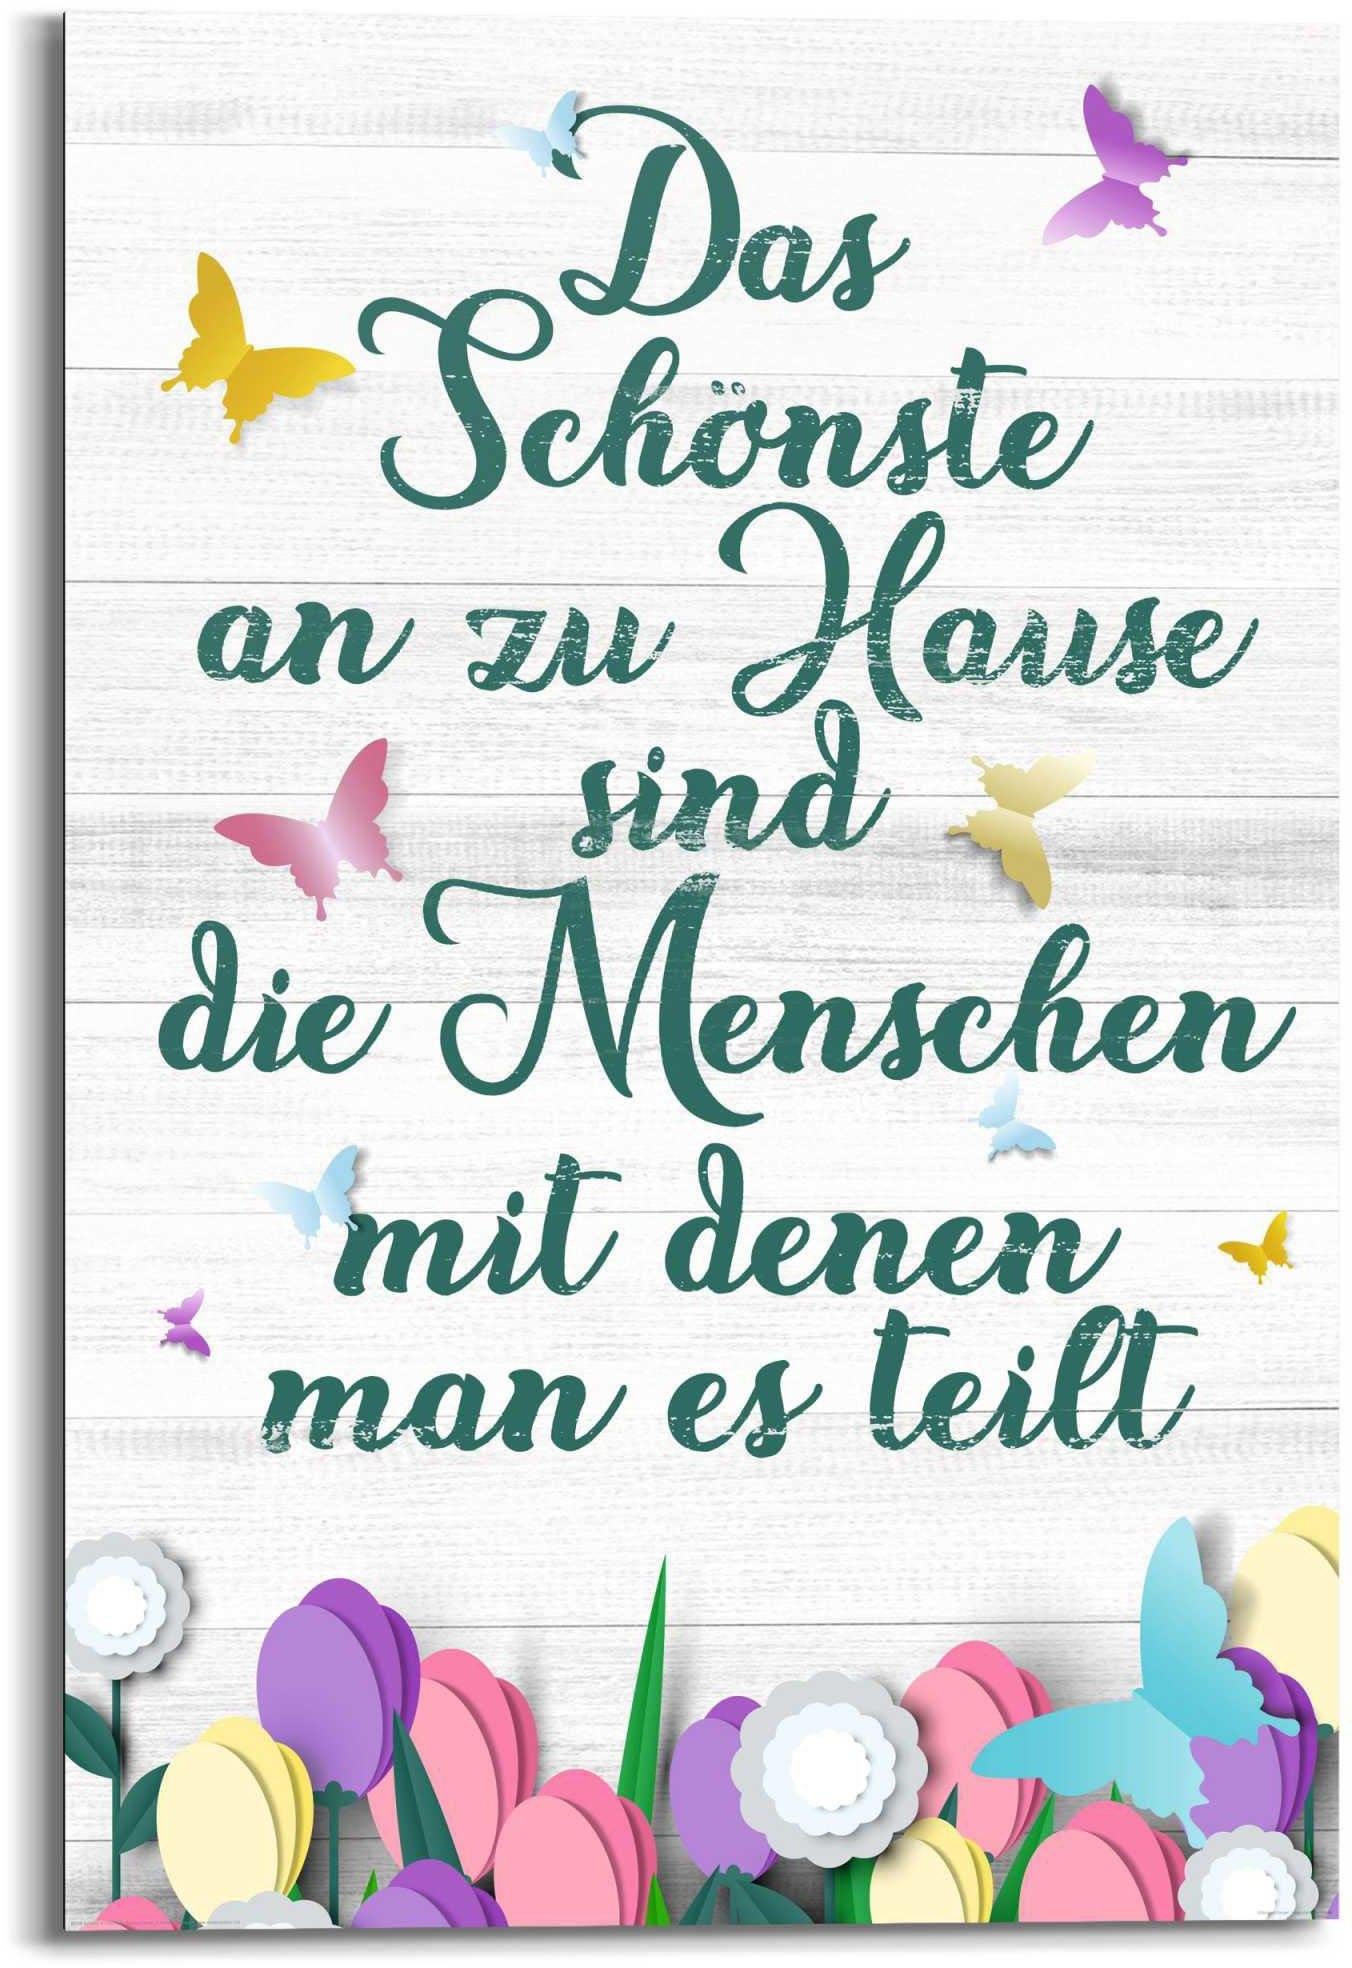 Reinders! artprint Wandbild Zu Hause Familien - Lebensfreude - Weisheit (1 stuk) in de webshop van OTTO kopen